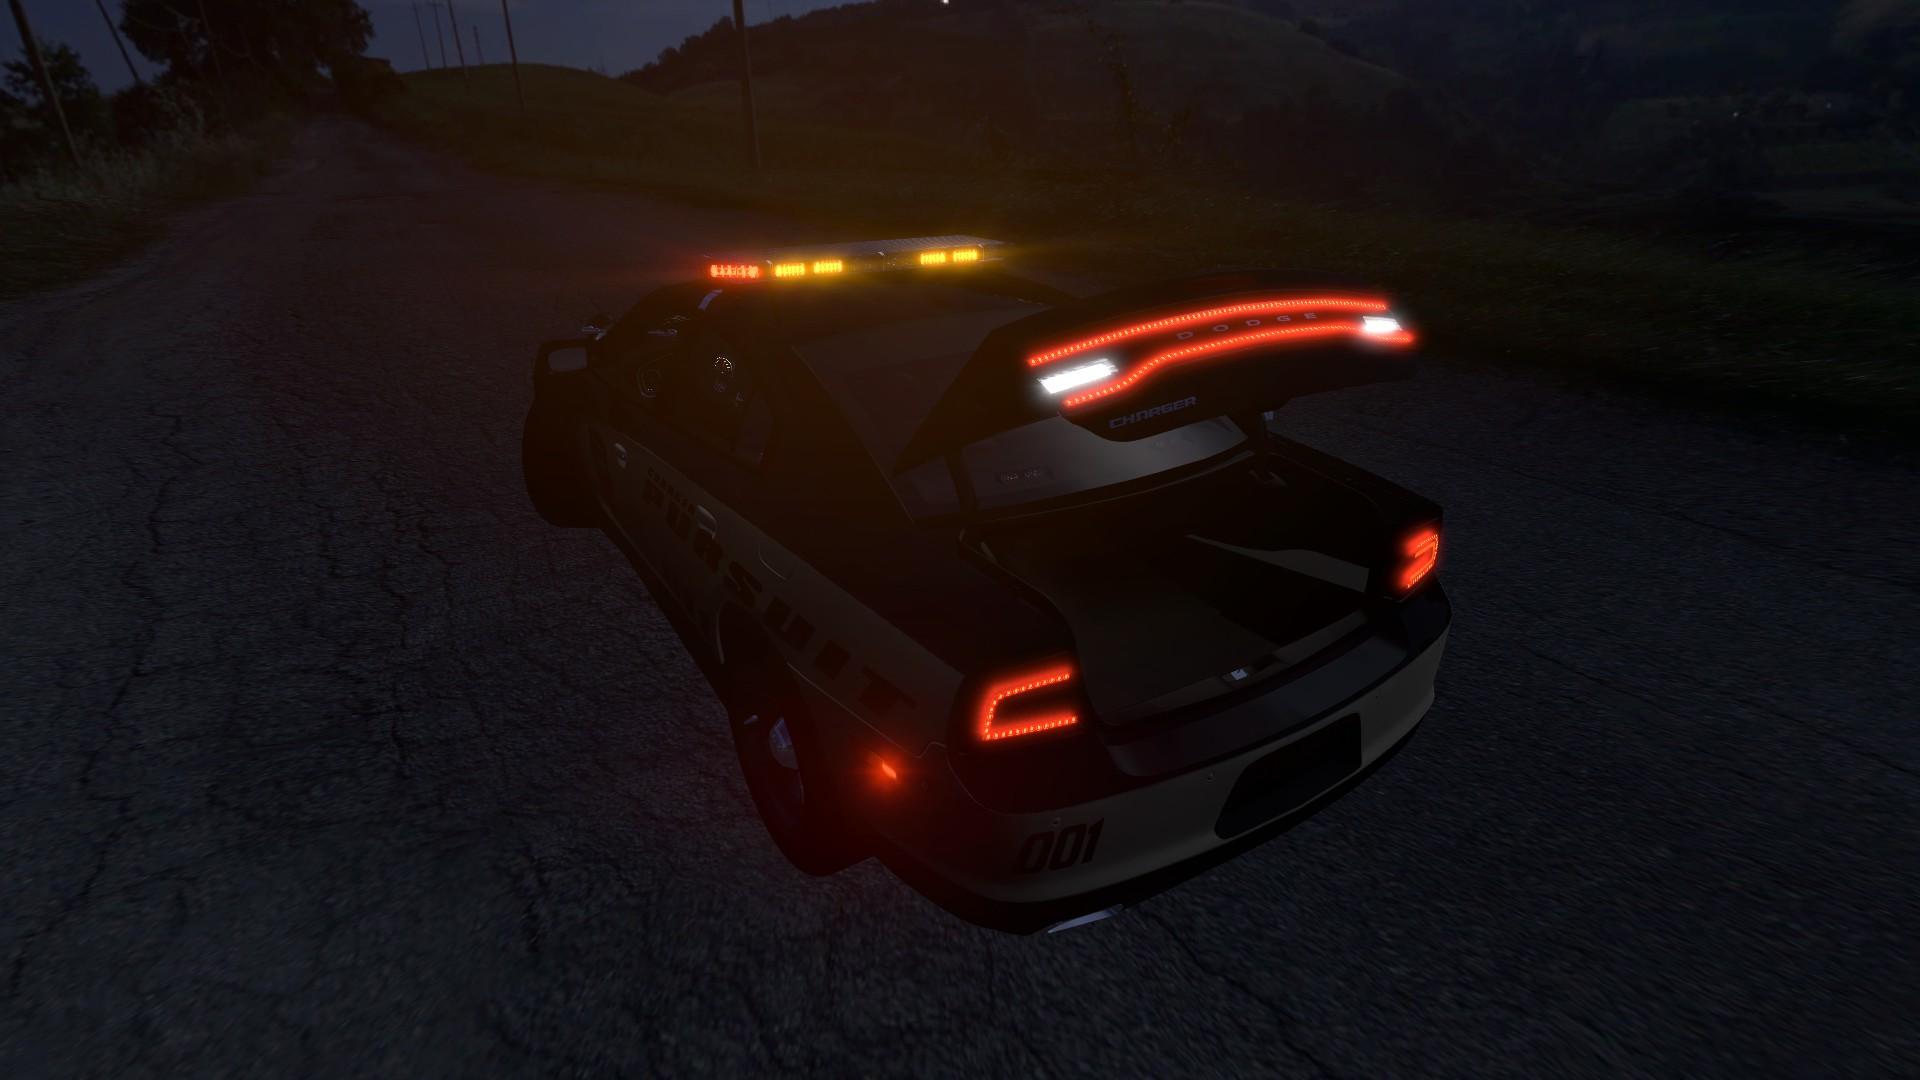 VCMod Main (Lights, seats, damage, exhaust,    )